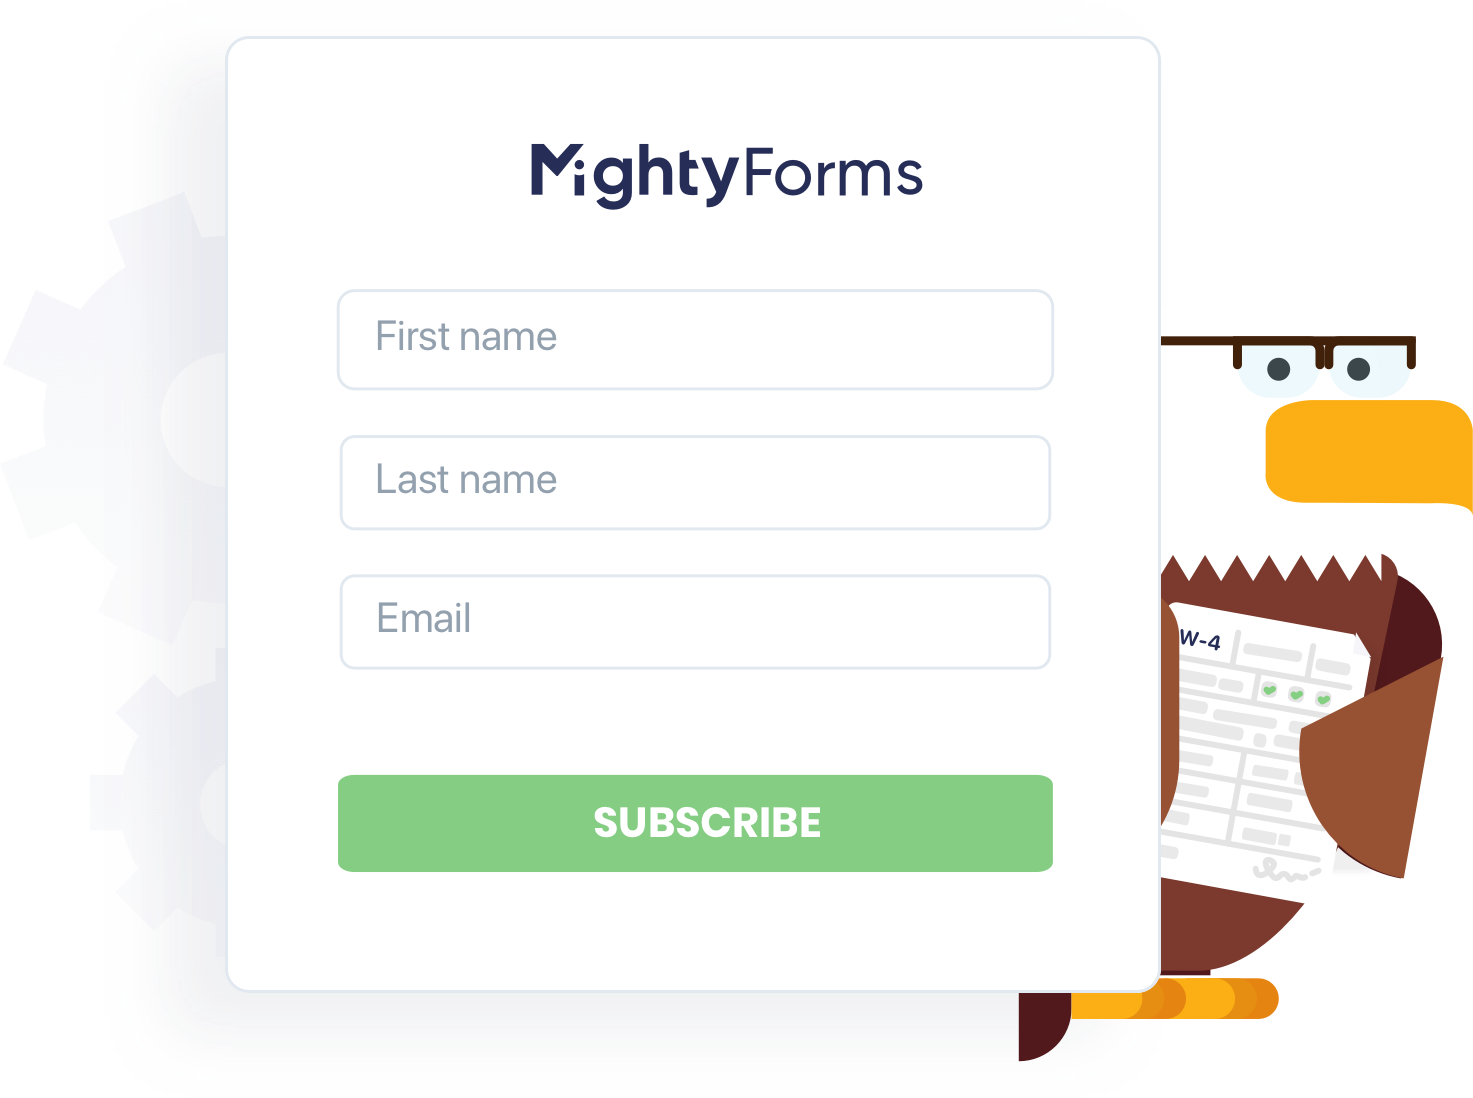 Screenshot of interface - Mightyforms